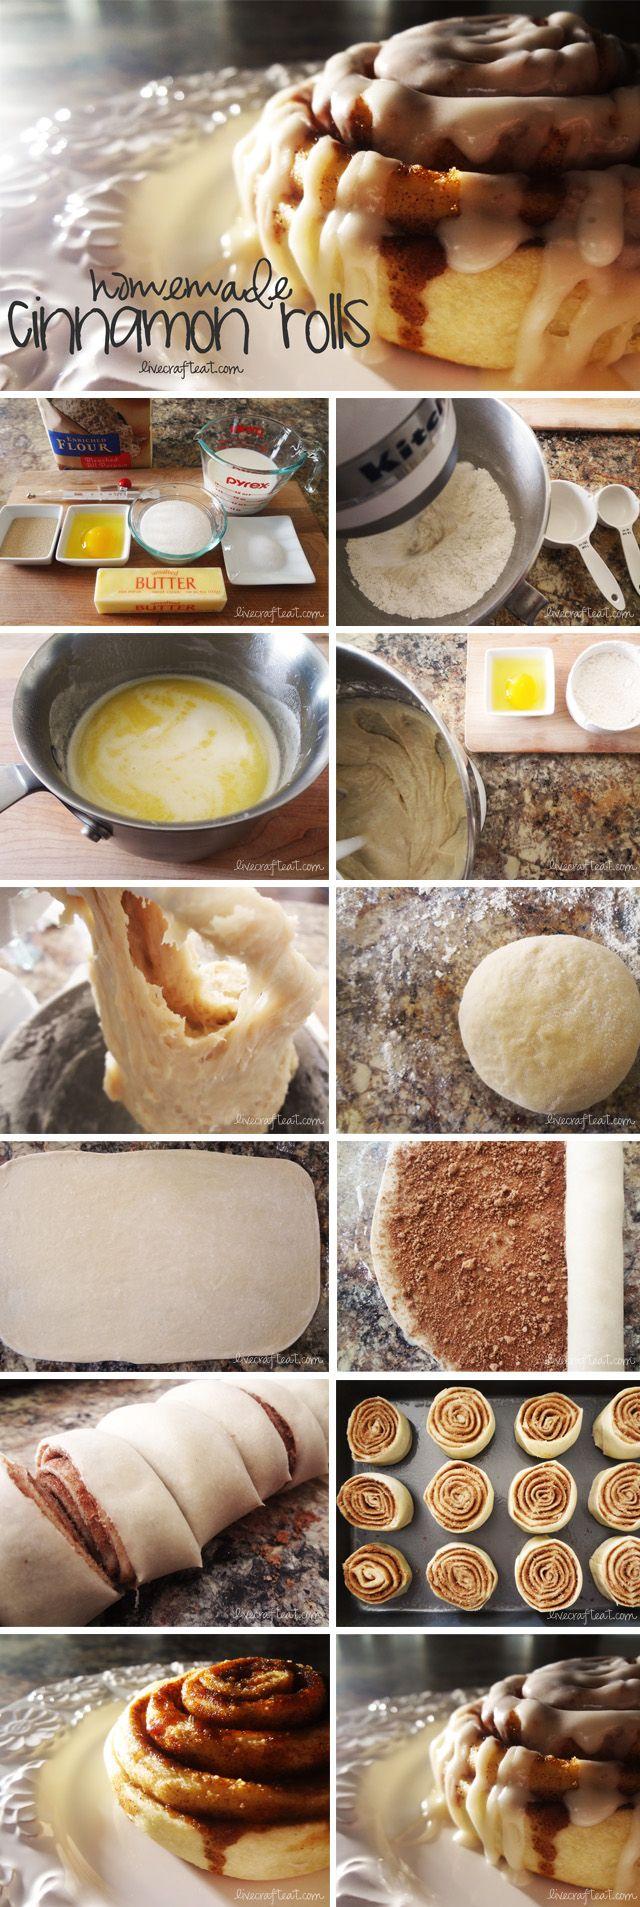 easy homemade cinnamon rolls recipe